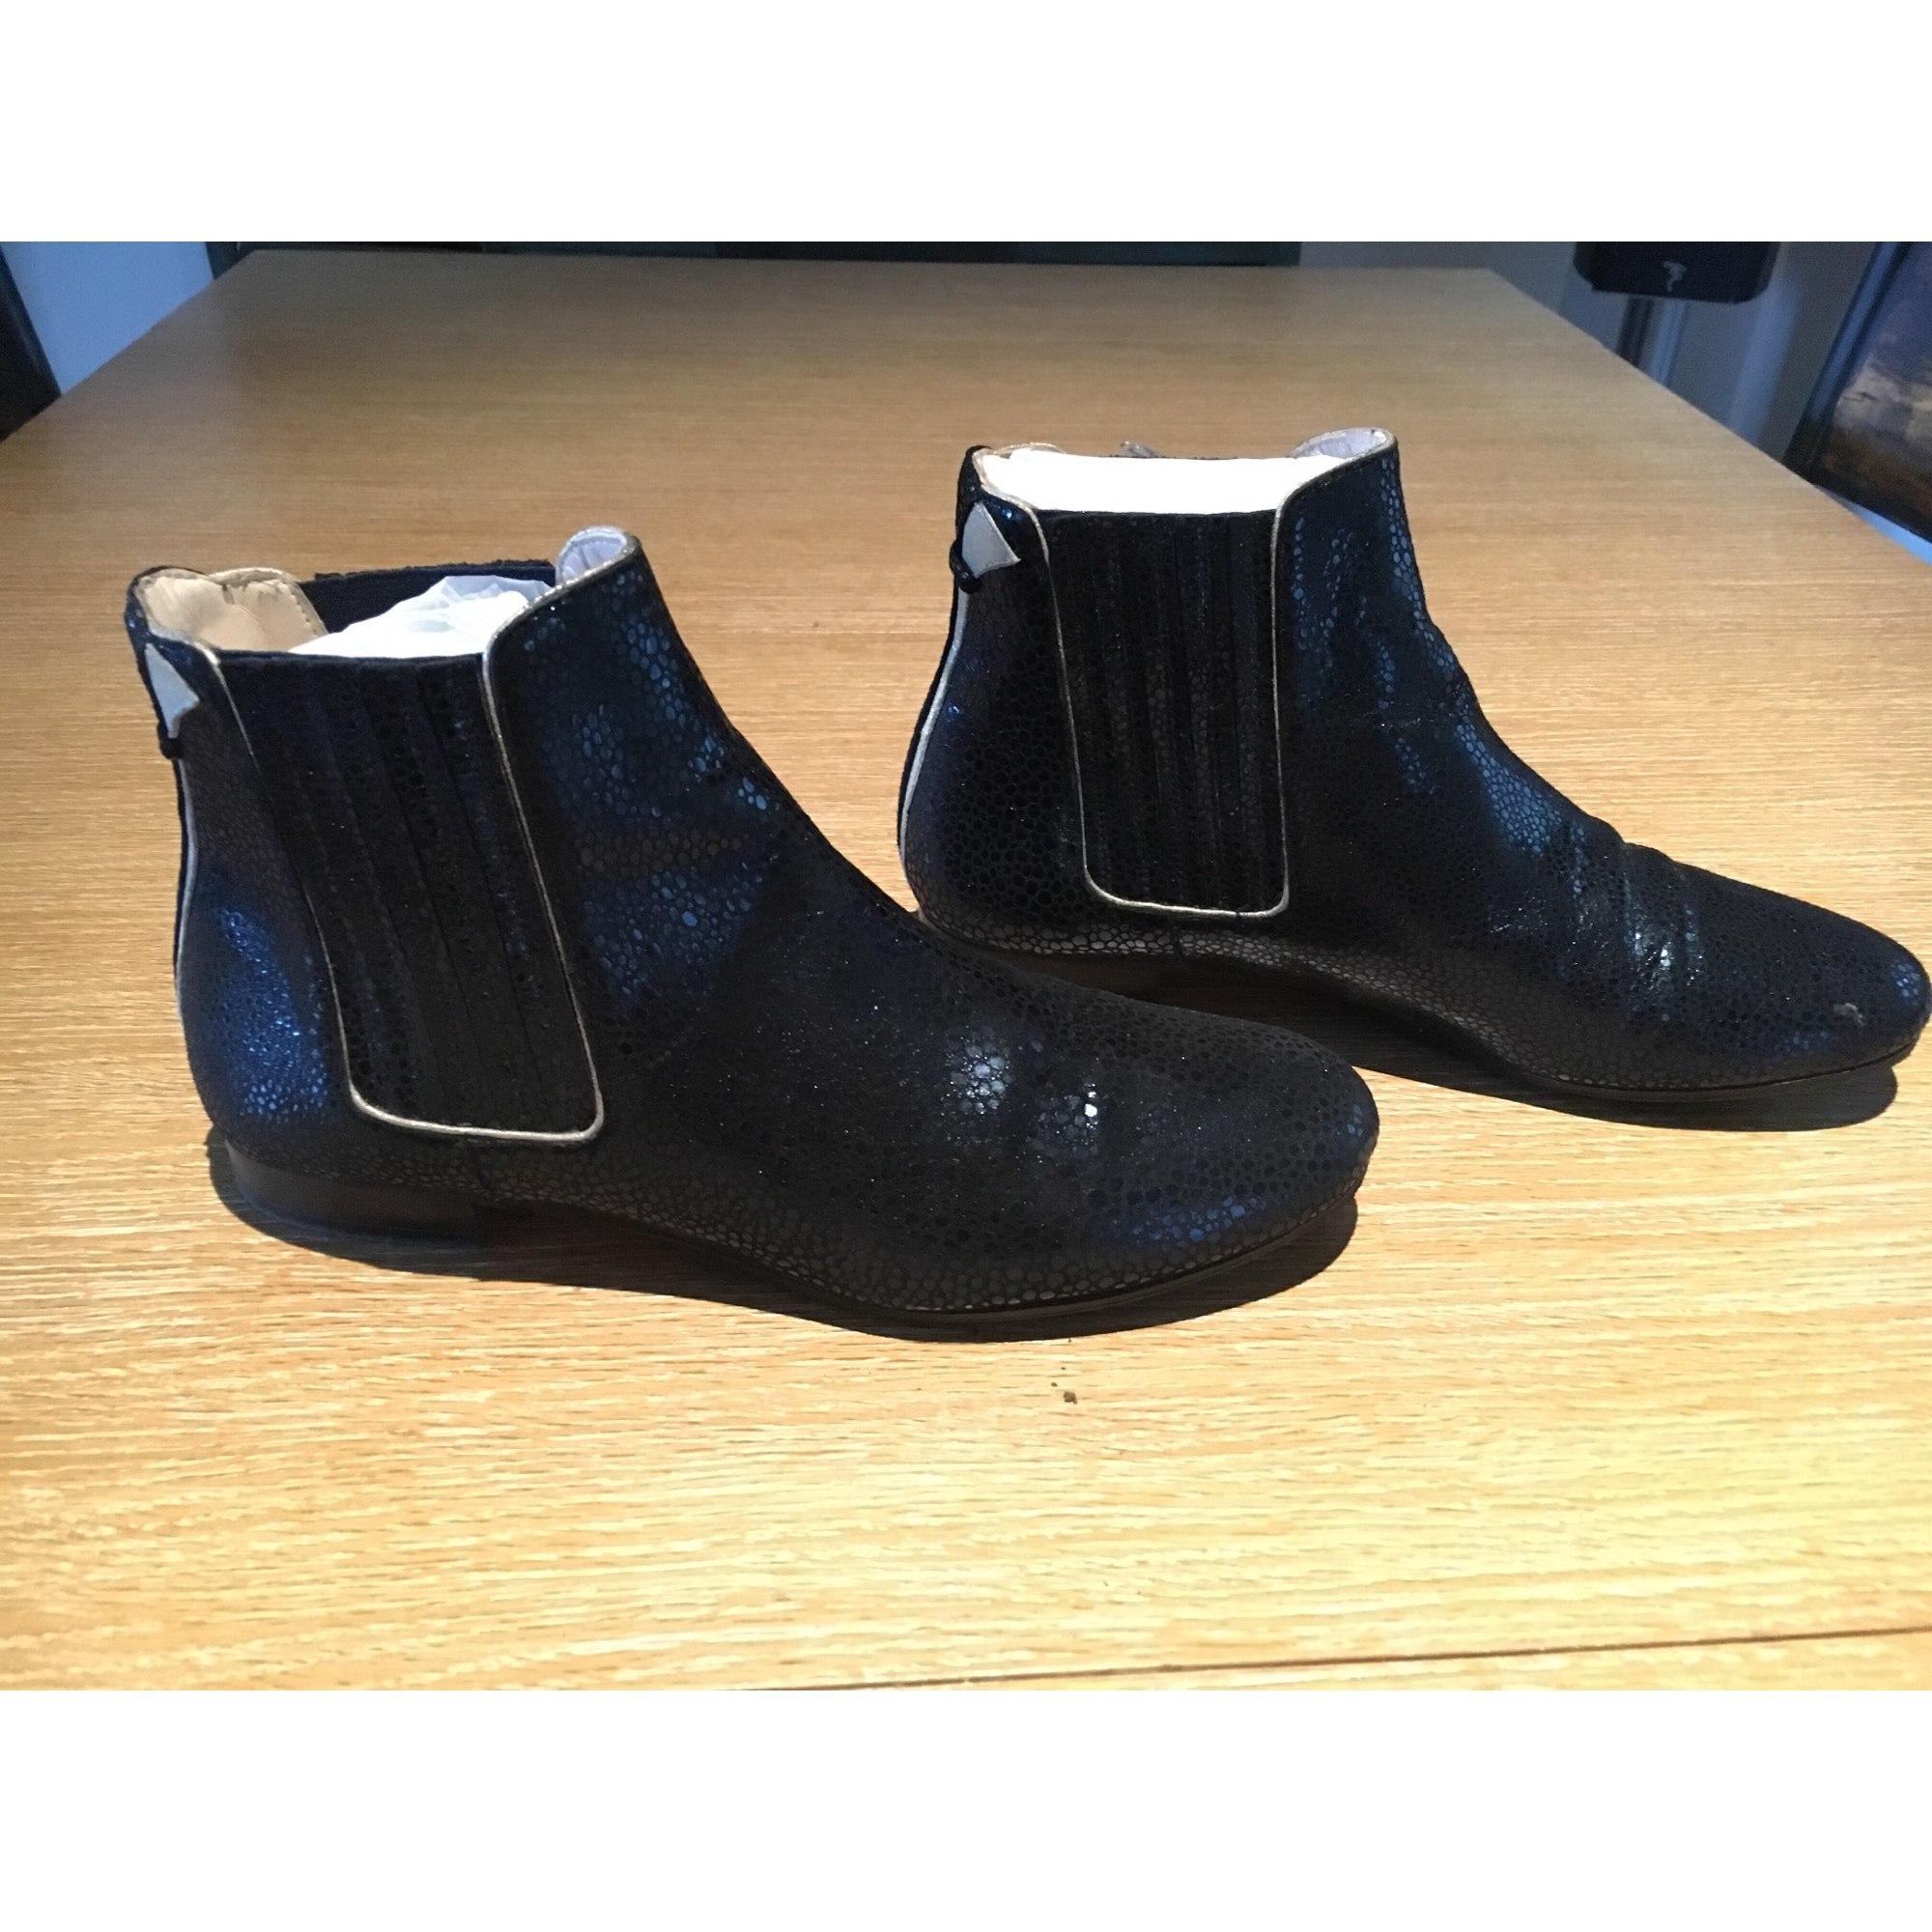 Boots 7383173 Blanchet Bleu Patricia Plates Low Bottinesamp; 39 nX0wOkPZN8